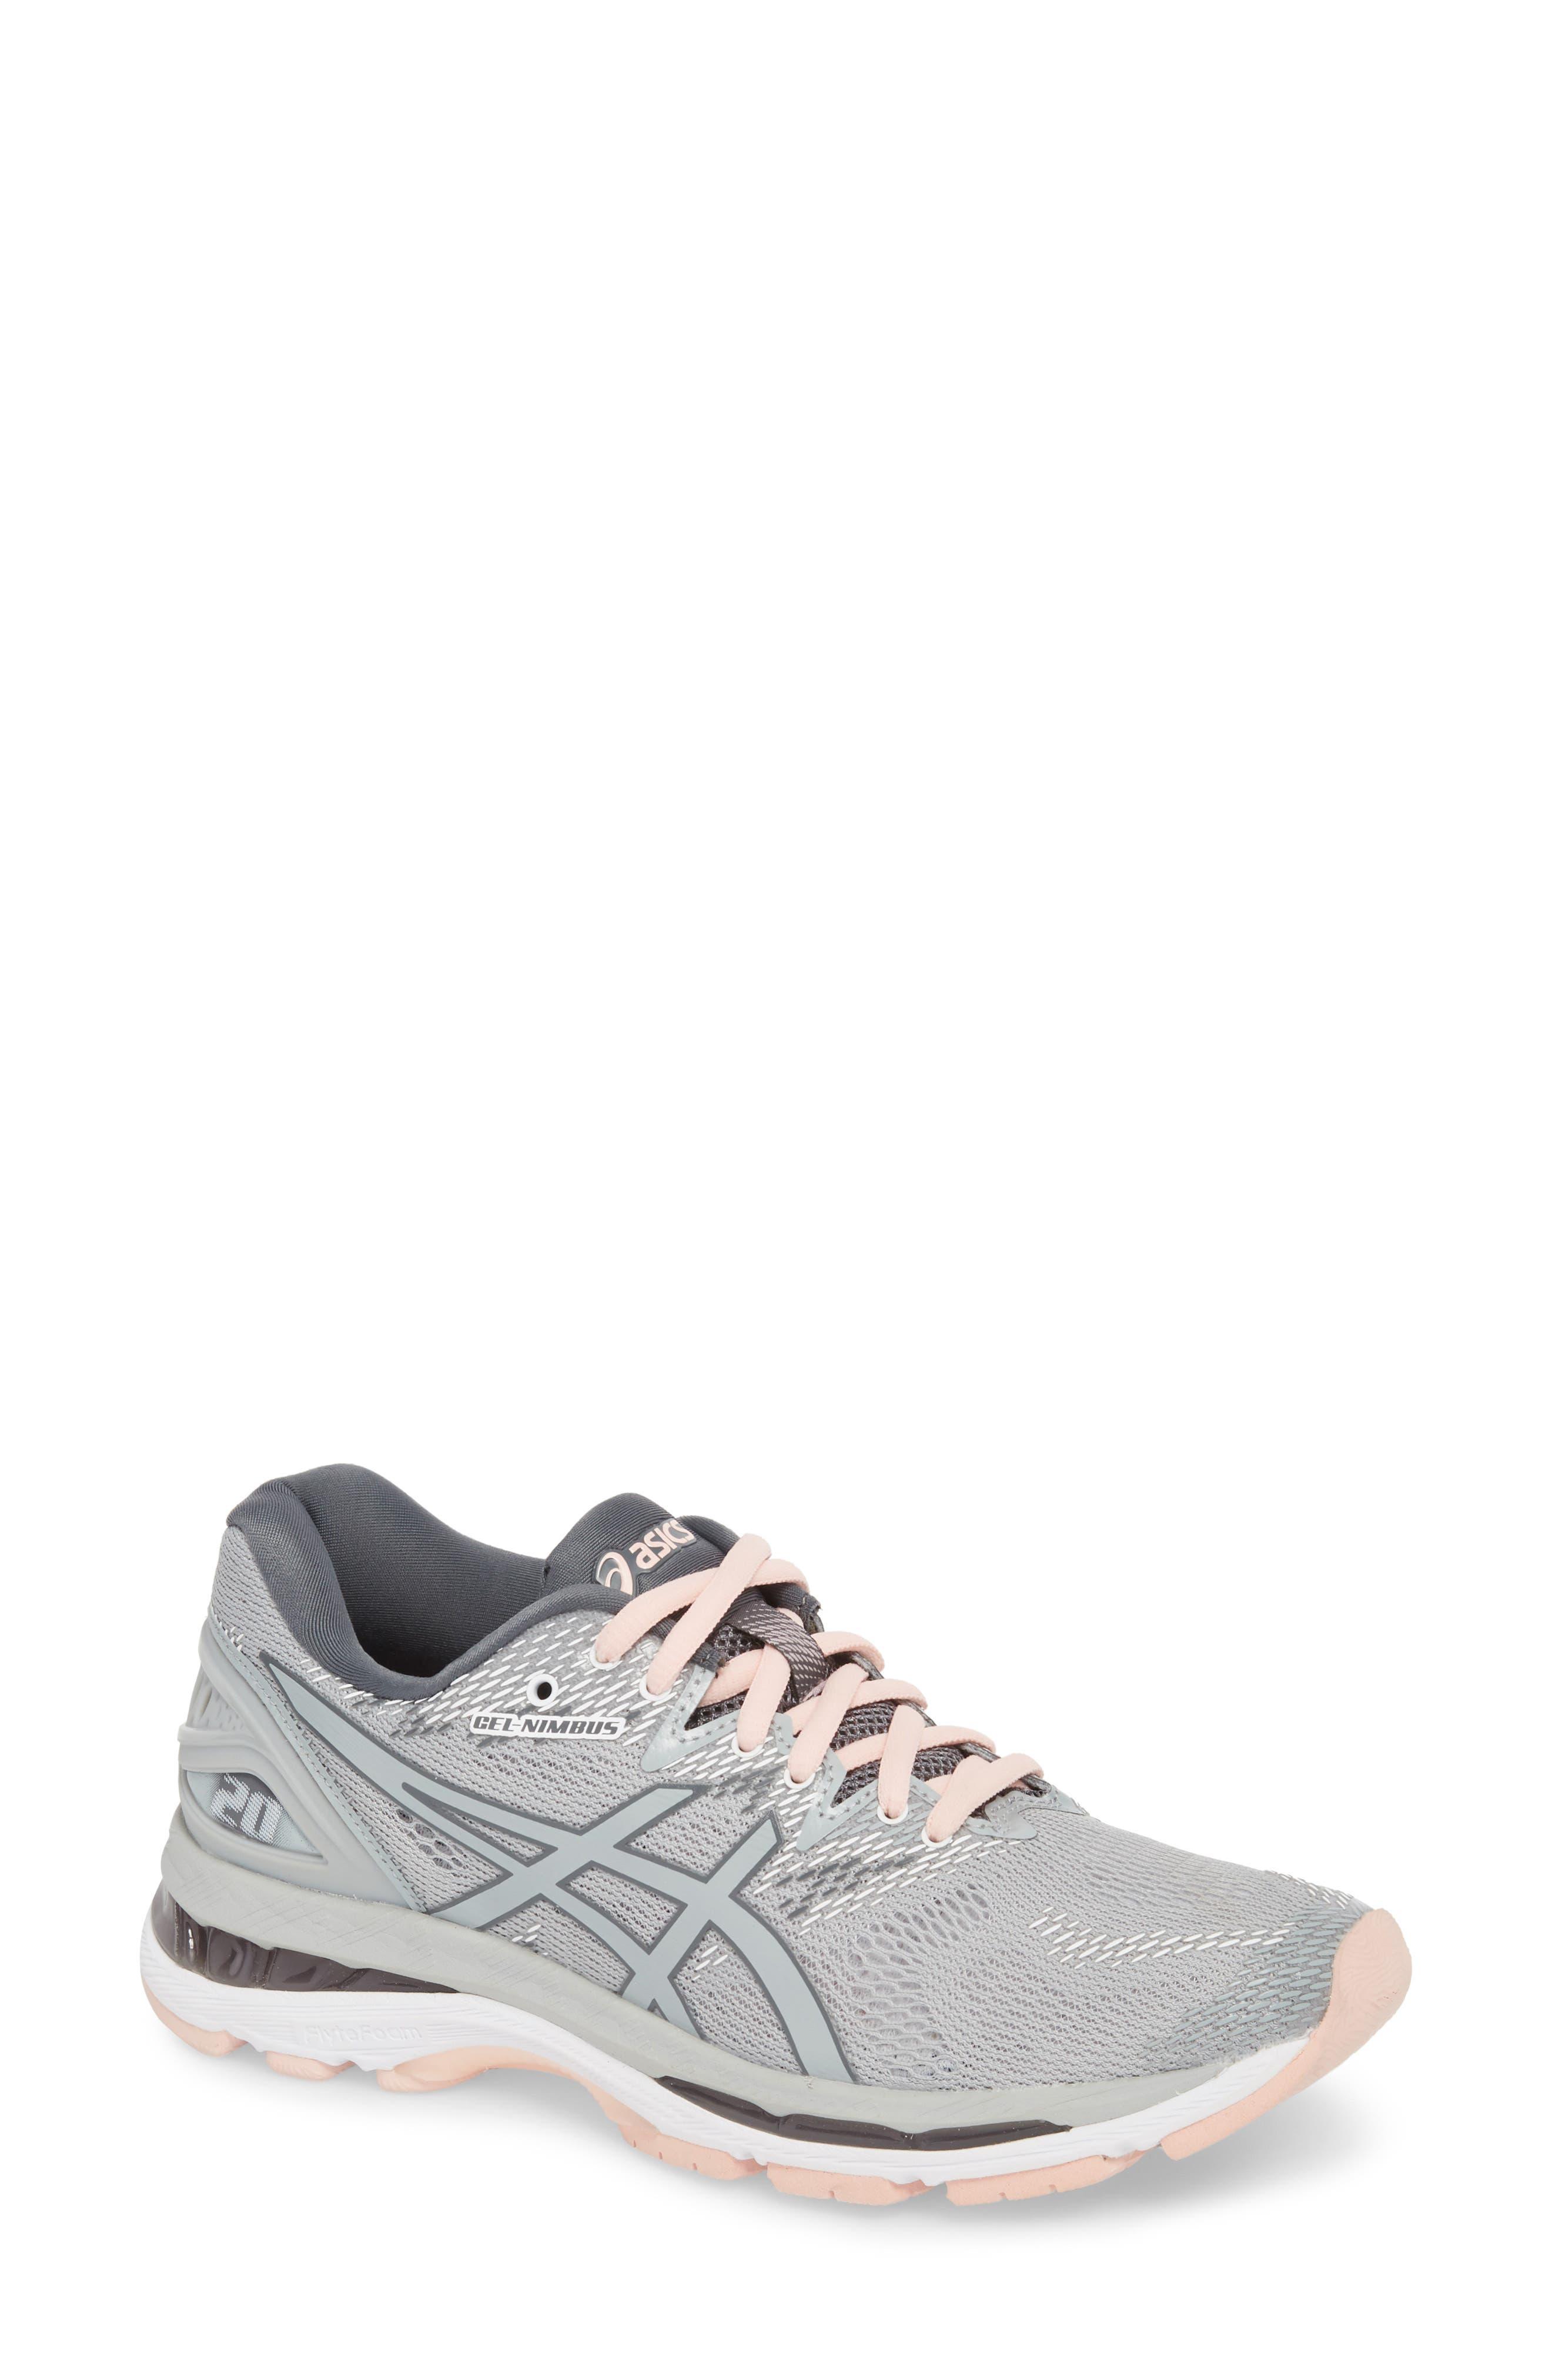 ASICS<SUP>®</SUP>,                             GEL<sup>®</sup>-Nimbus 20 Running Shoe,                             Main thumbnail 1, color,                             069